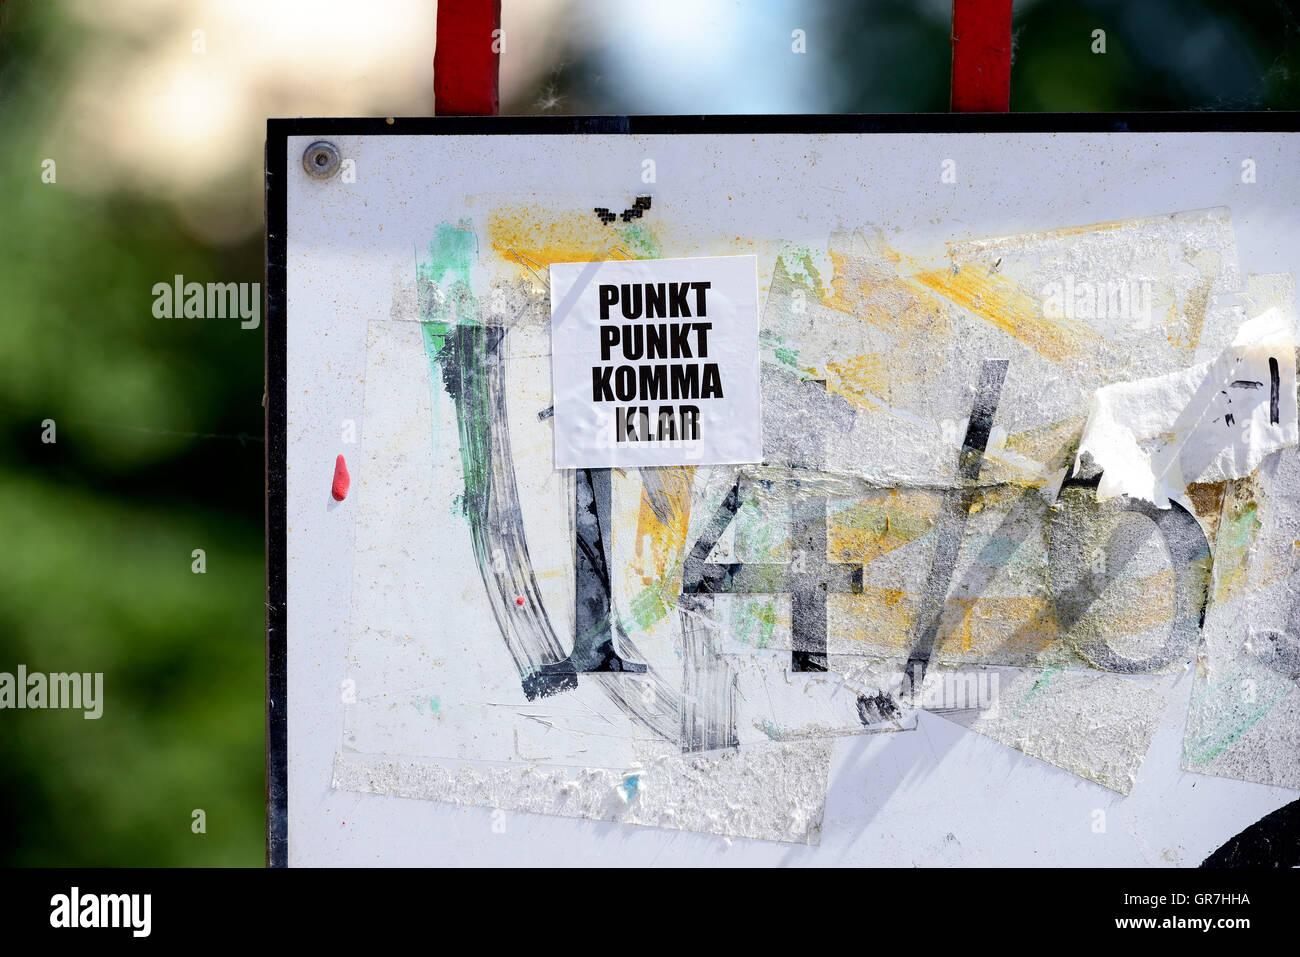 Poetry Slogan Sticker In Hamburg, Germany - Stock Image